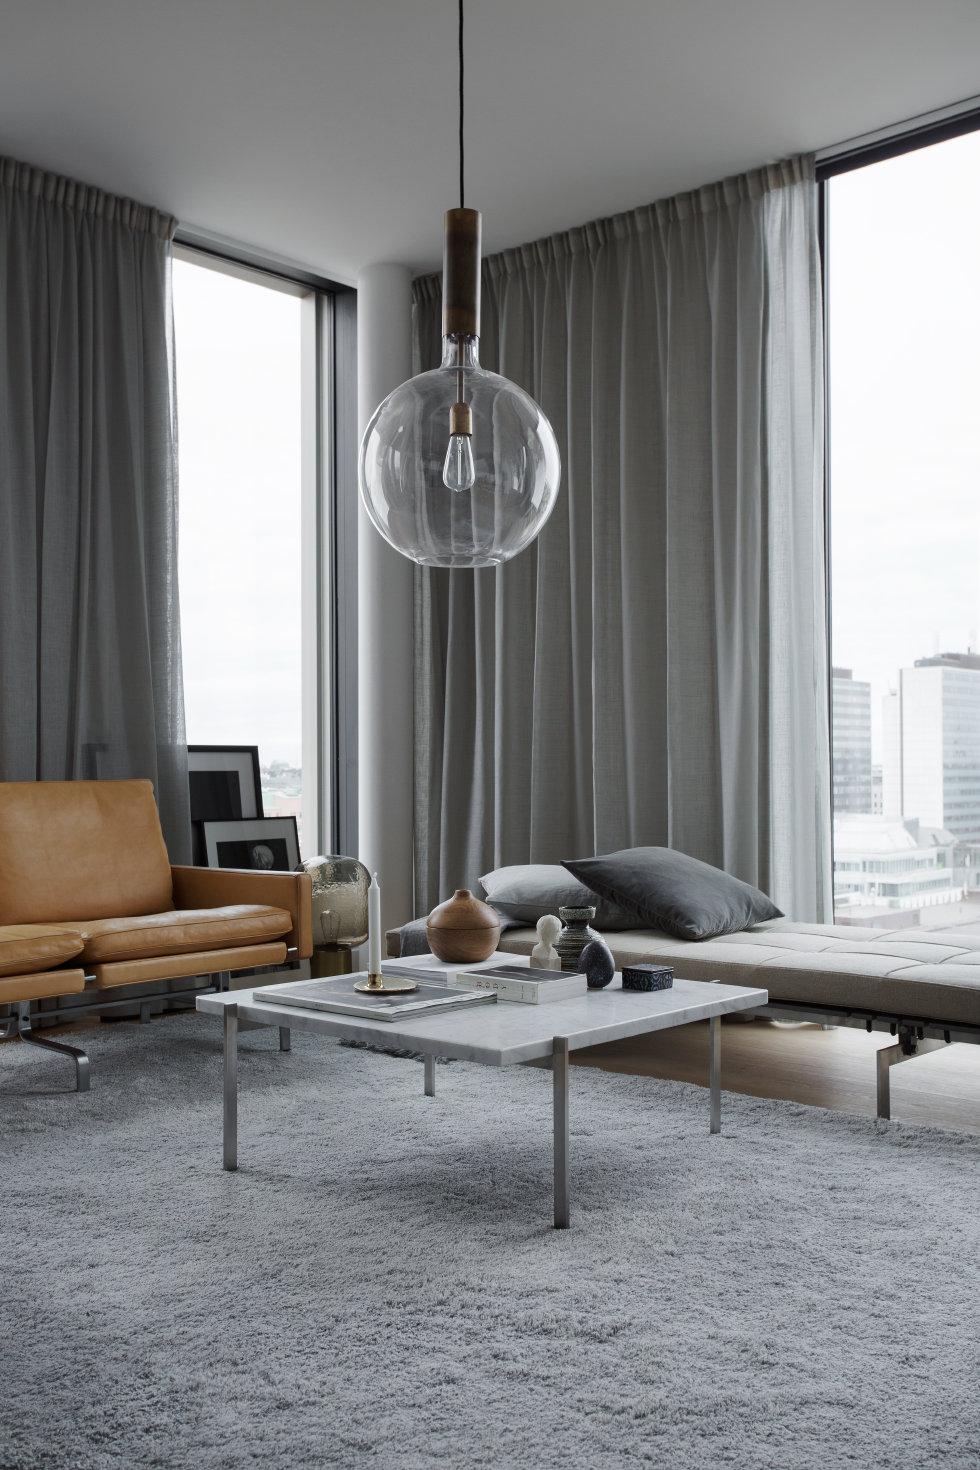 inredningsinspiration_continental-apartments_badrumsdrommar_2